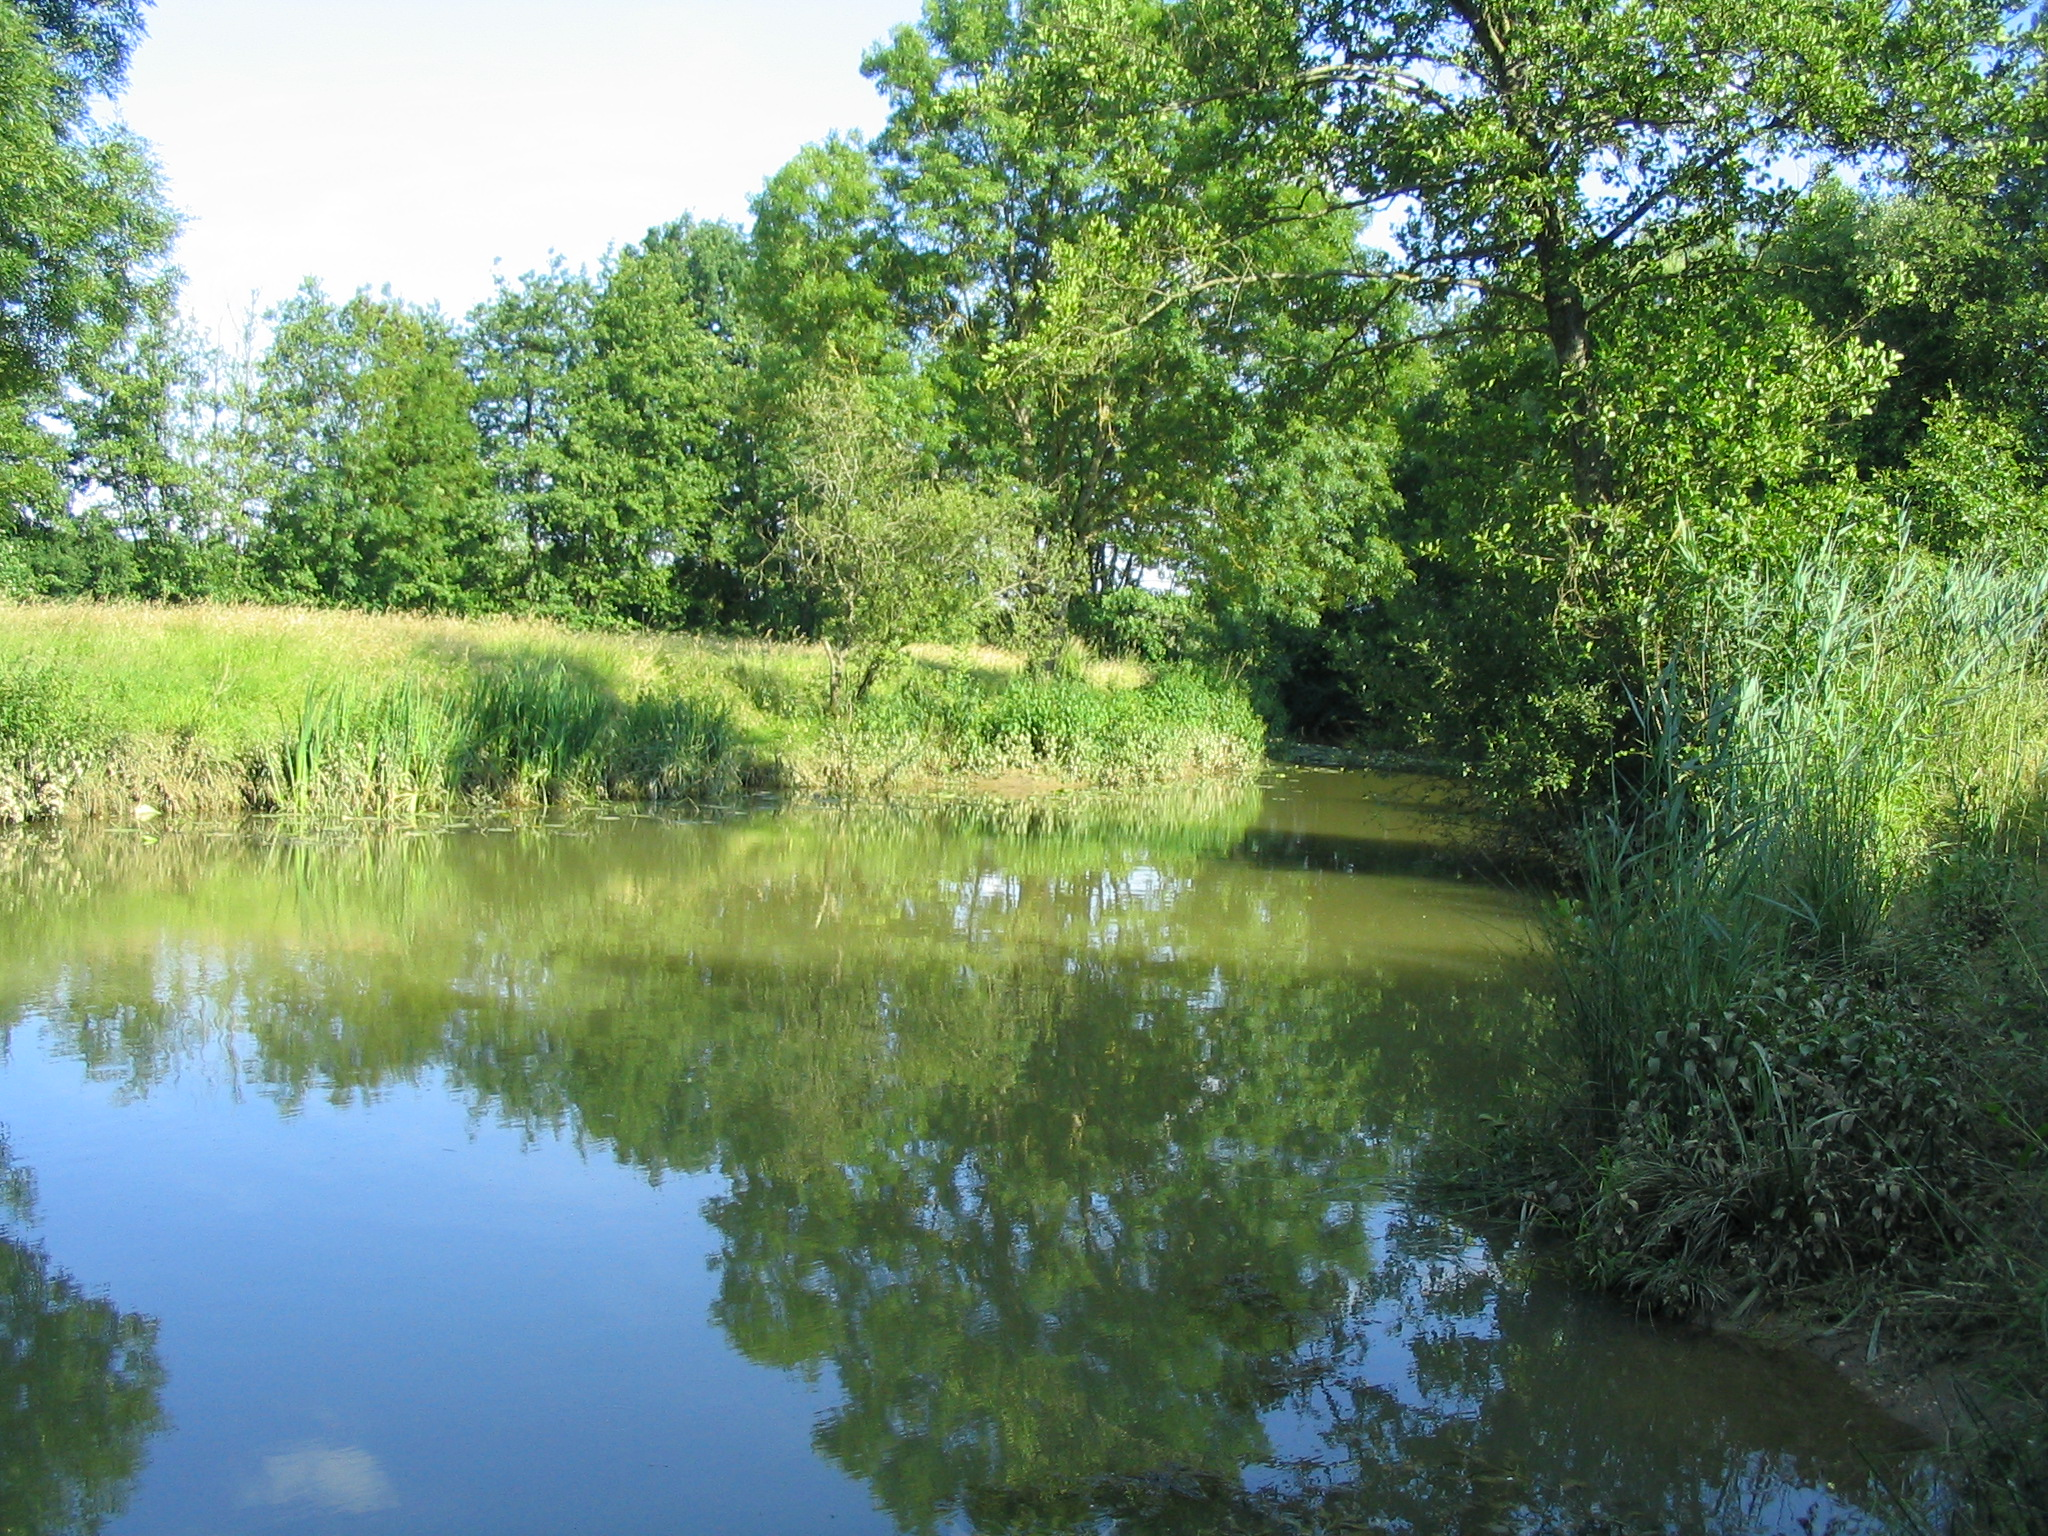 Pêche - Le Solnan - Bas Sevron